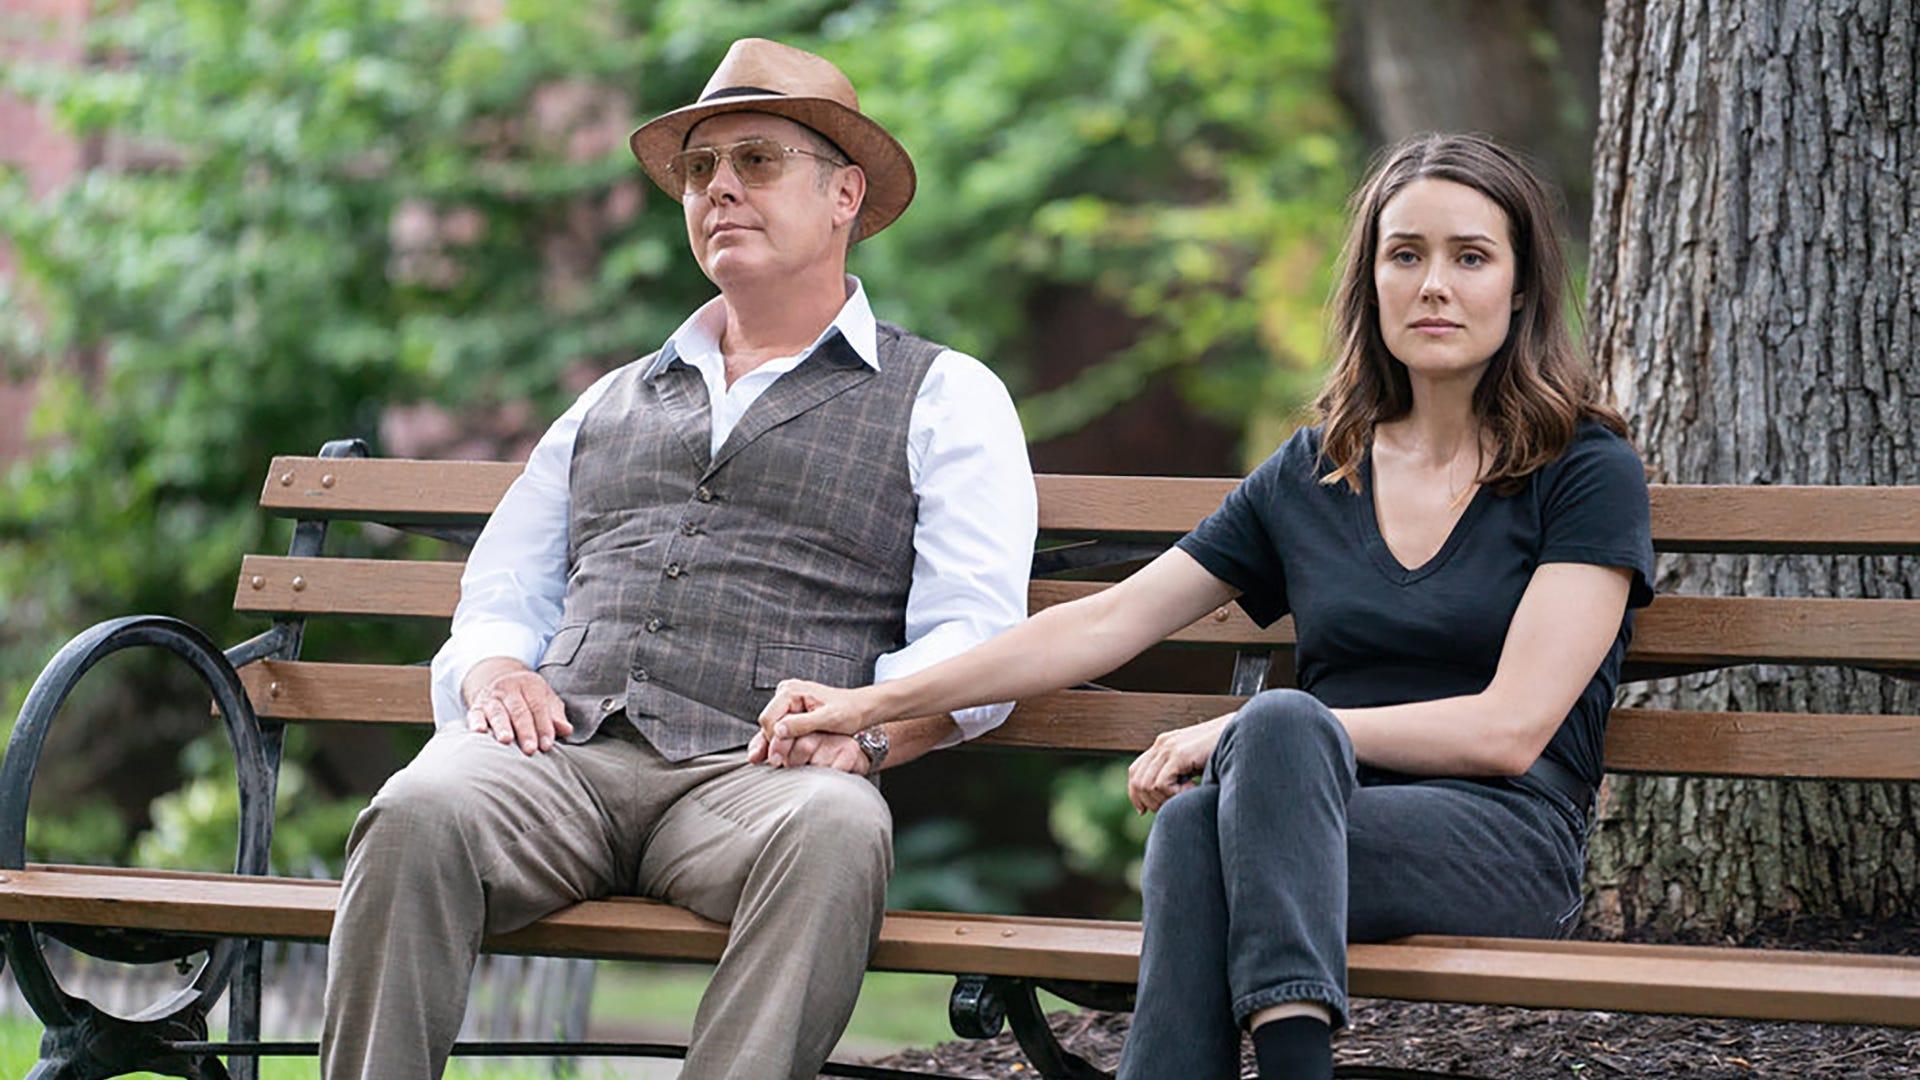 James Spader and Megan Boone, The Blacklist